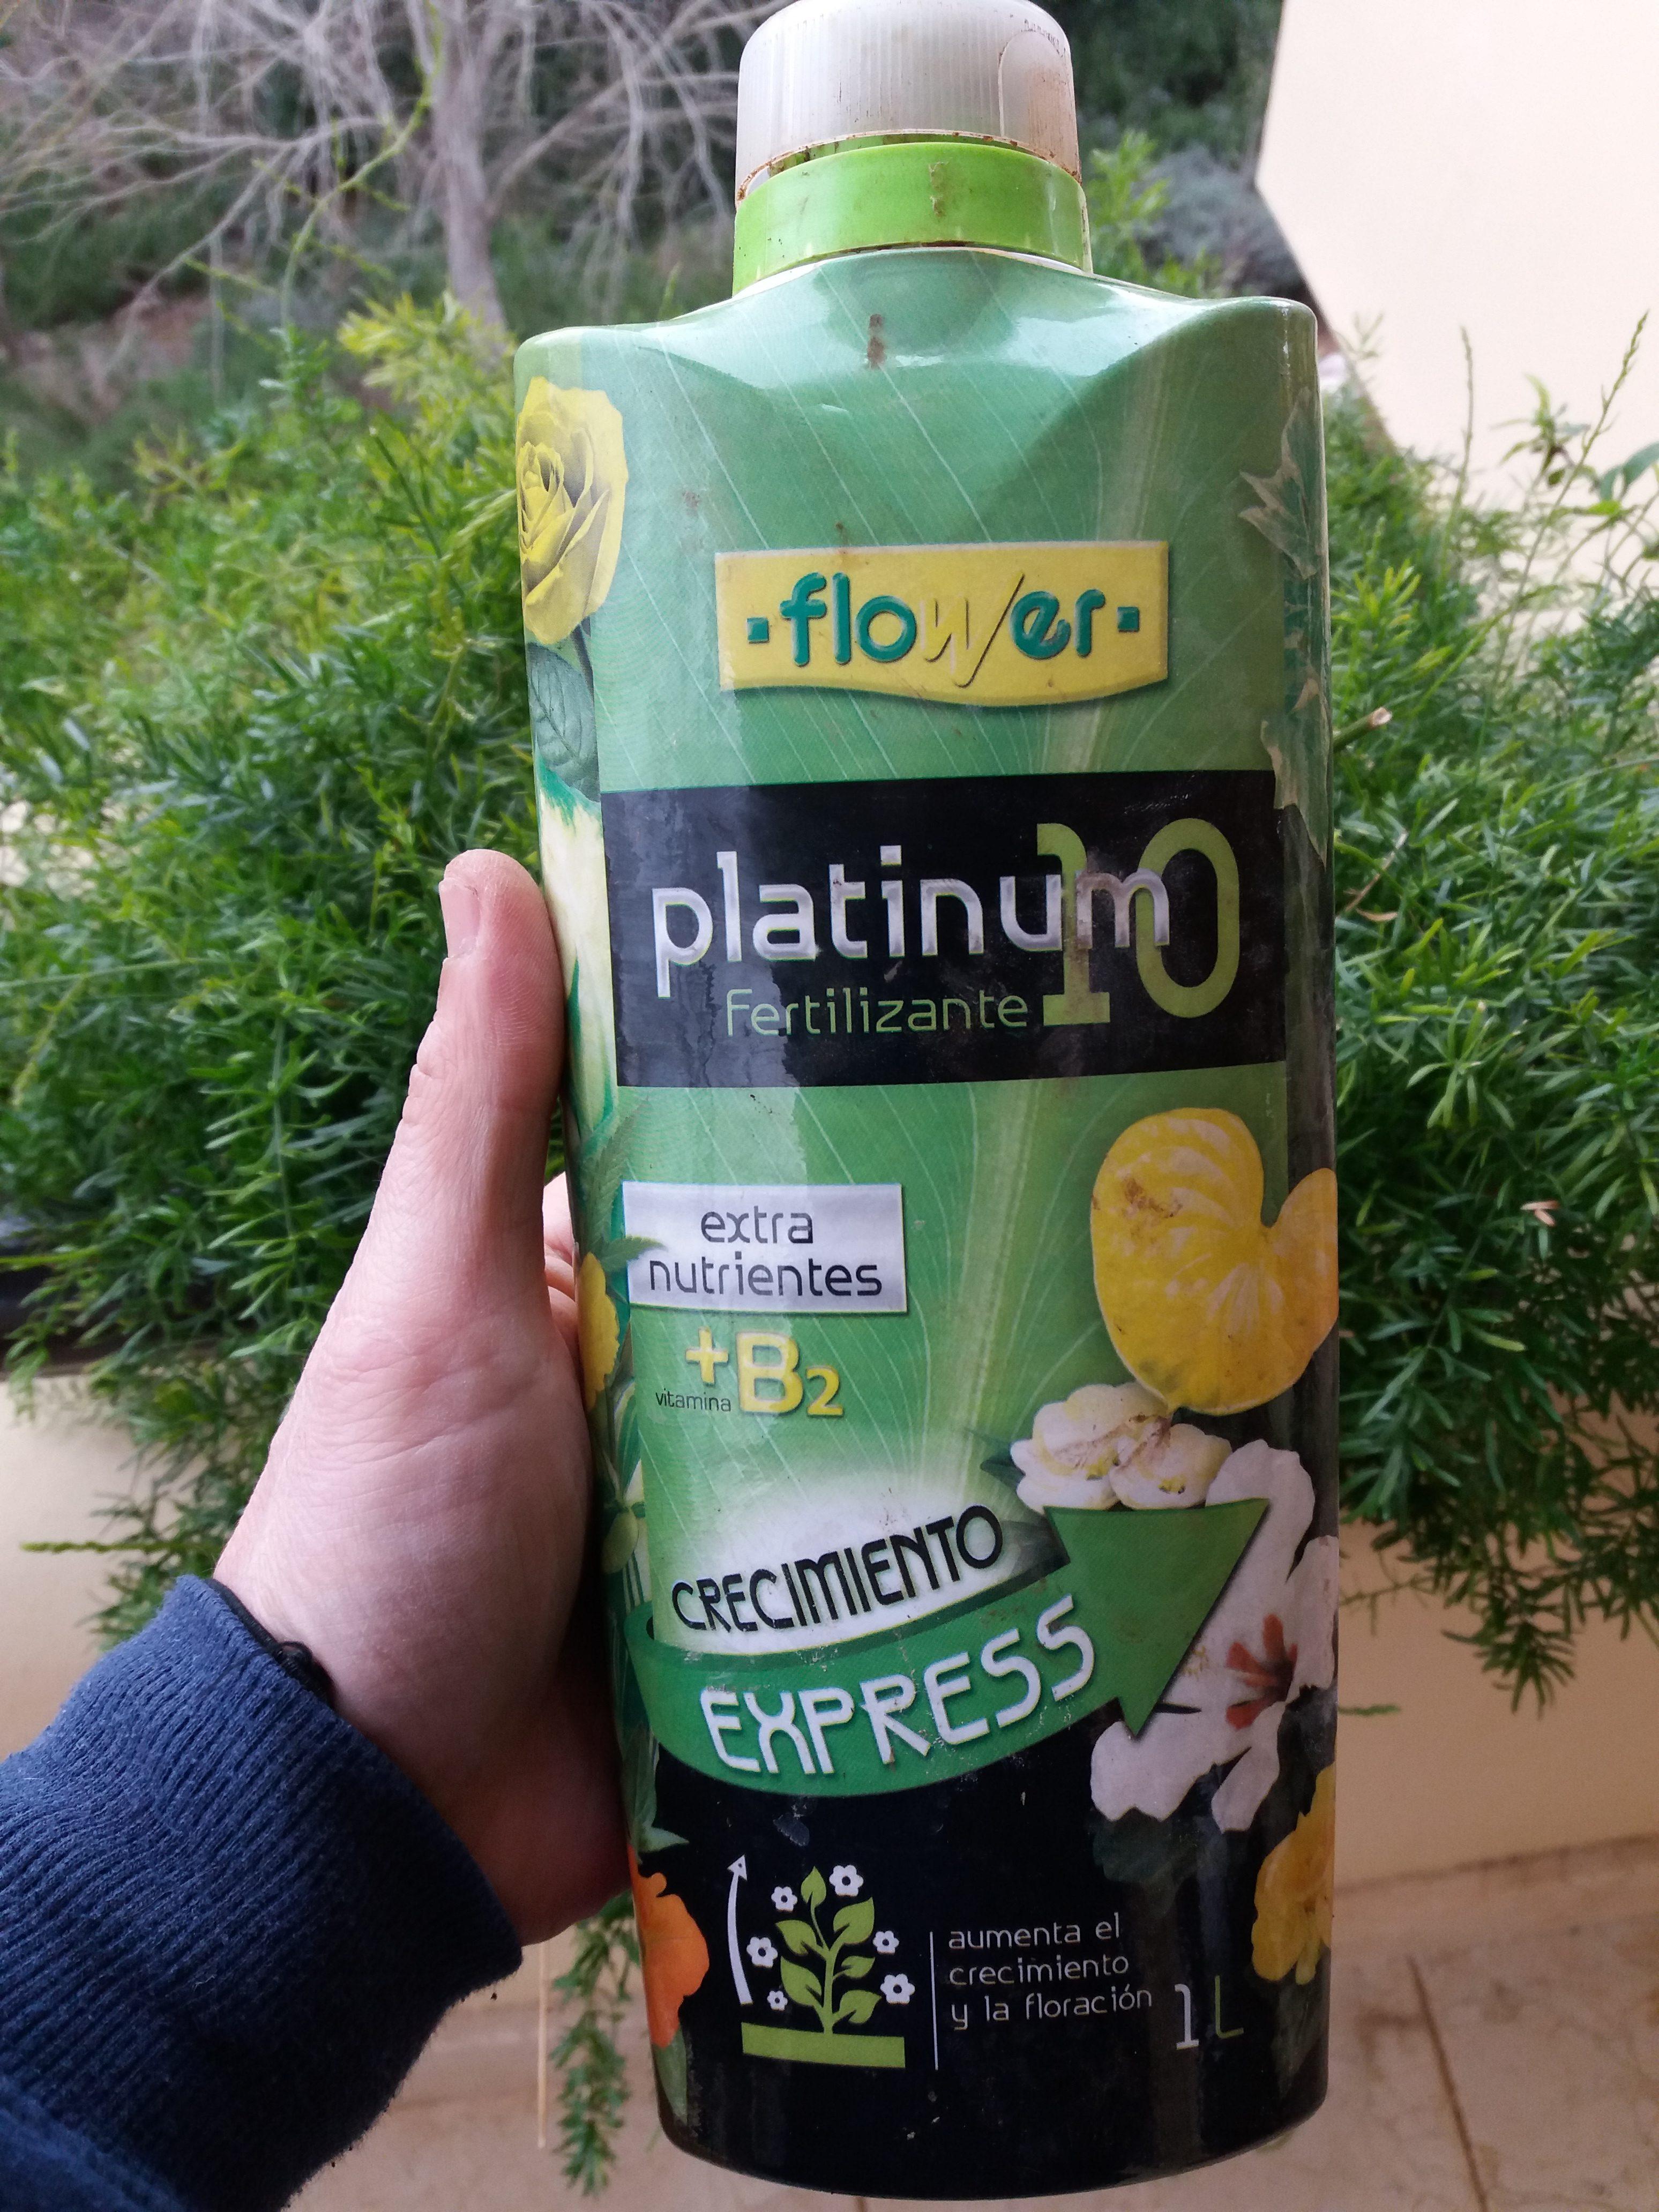 Fertilizante Platinum10, excelente.